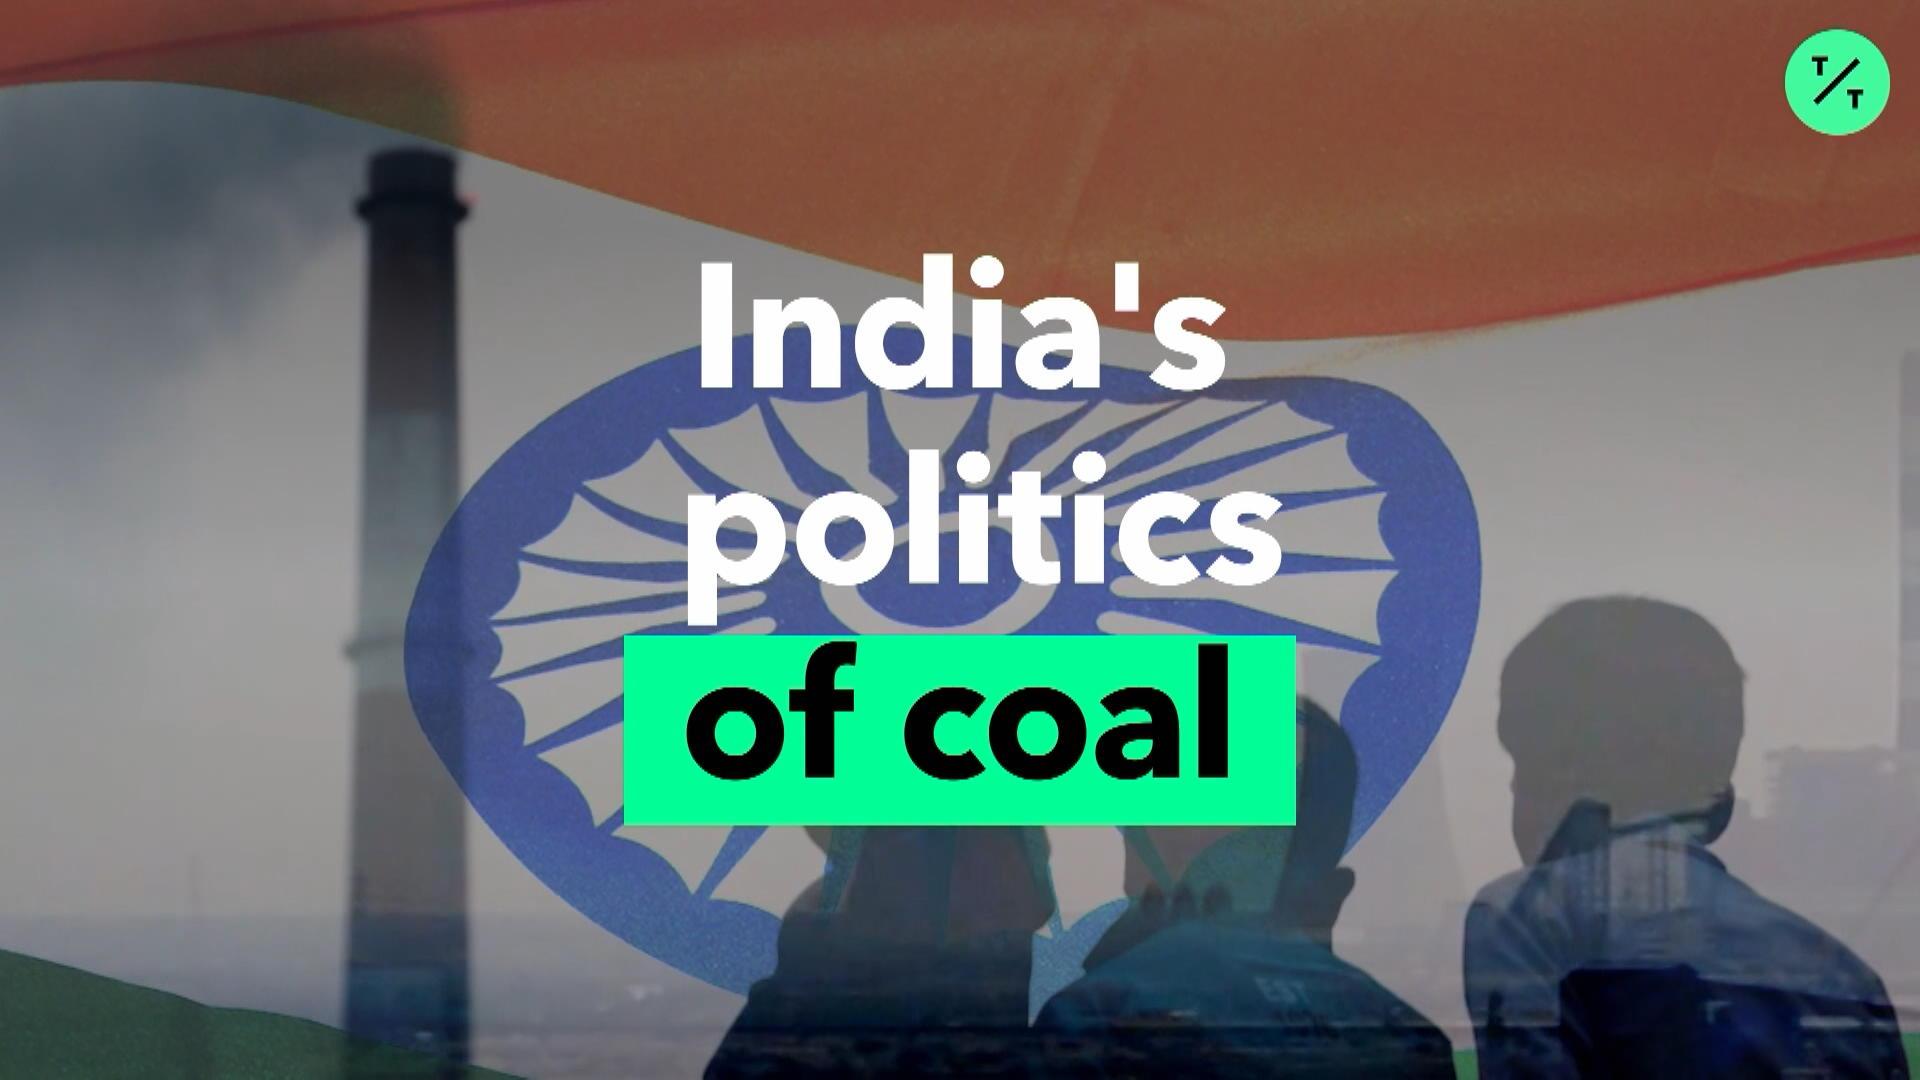 indias politics of coal � bloomberg